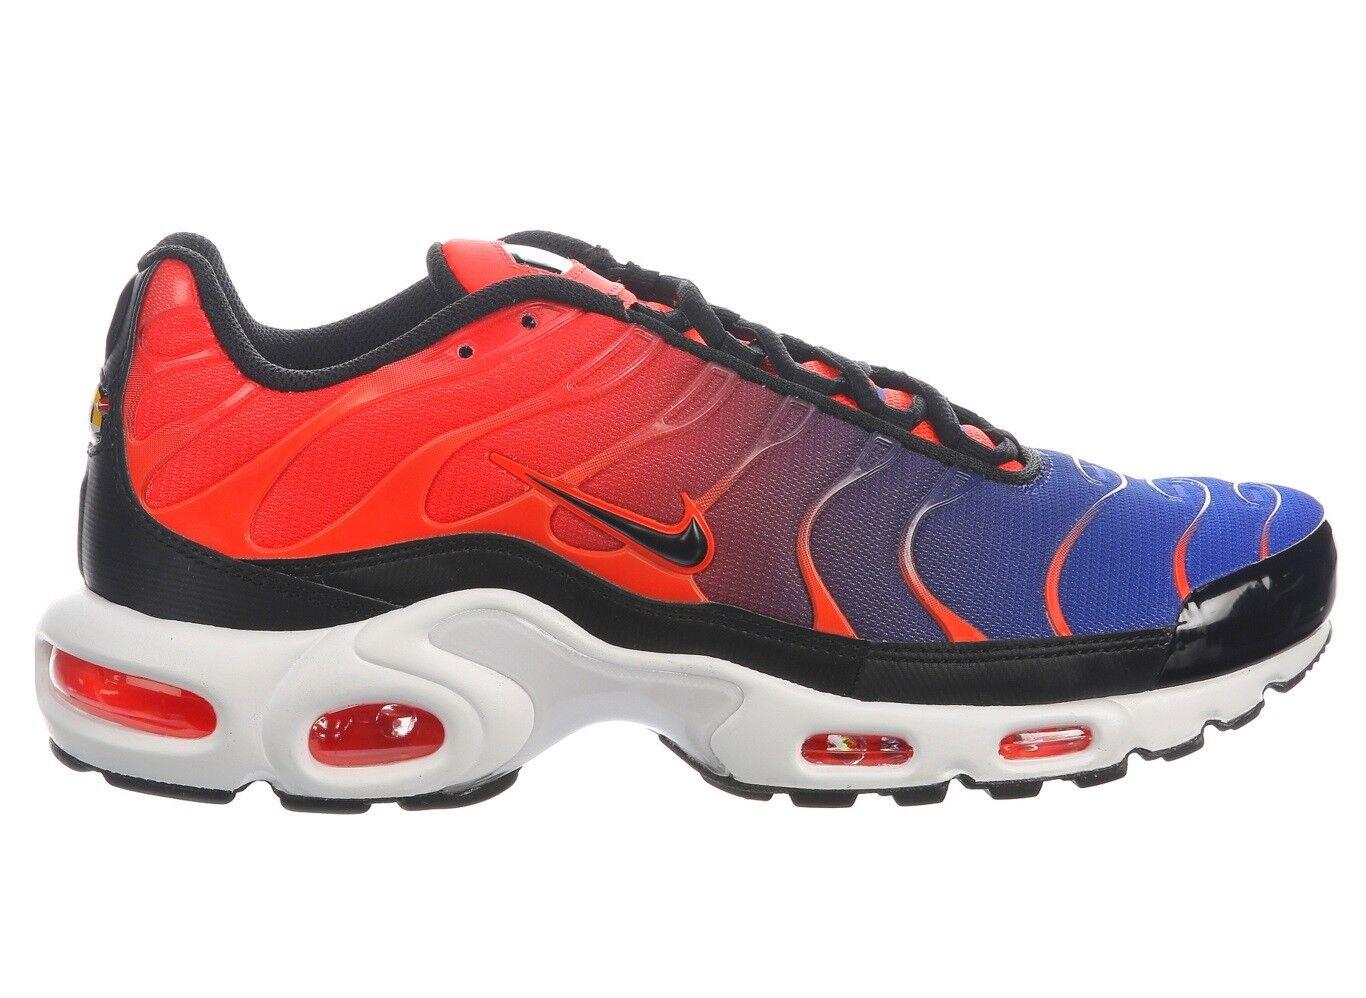 Nike air max piu 'uomini 852630-800 crimson nero blu scarpe taglia 8